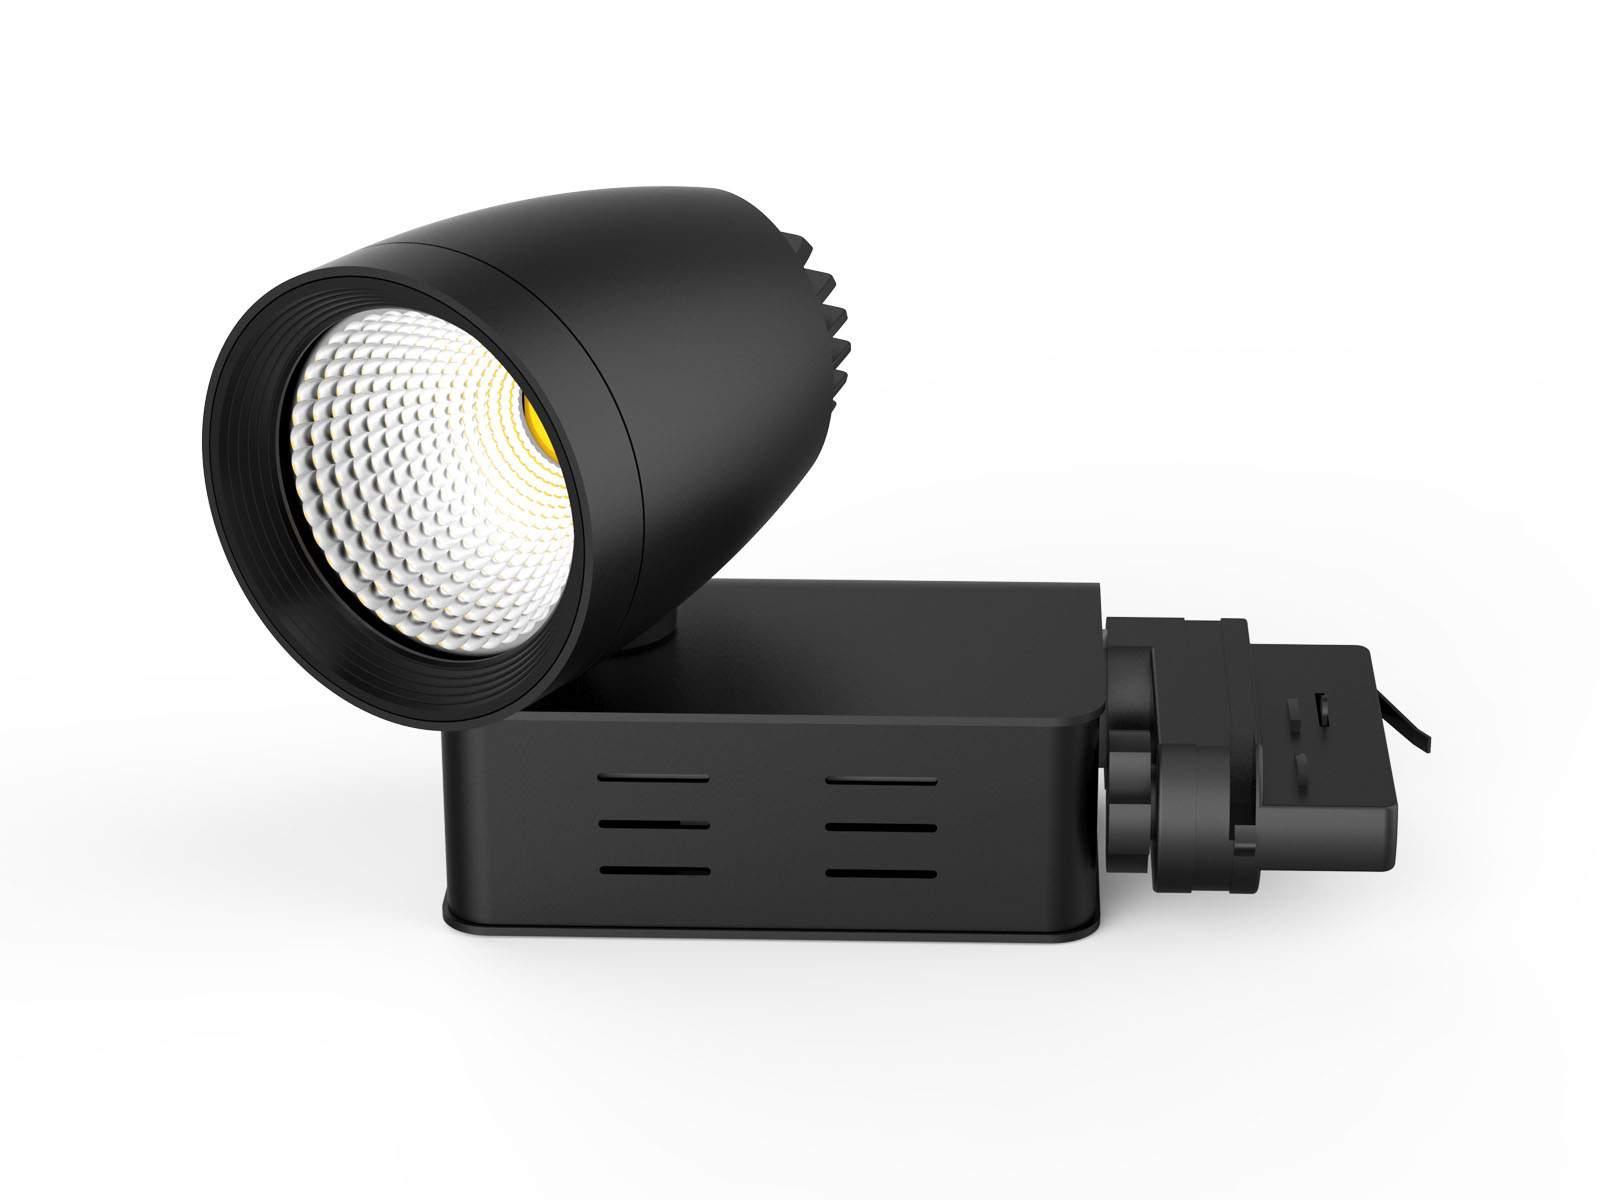 LED светильник на шине PROLUMEN Kiev черный  45W 4500lm